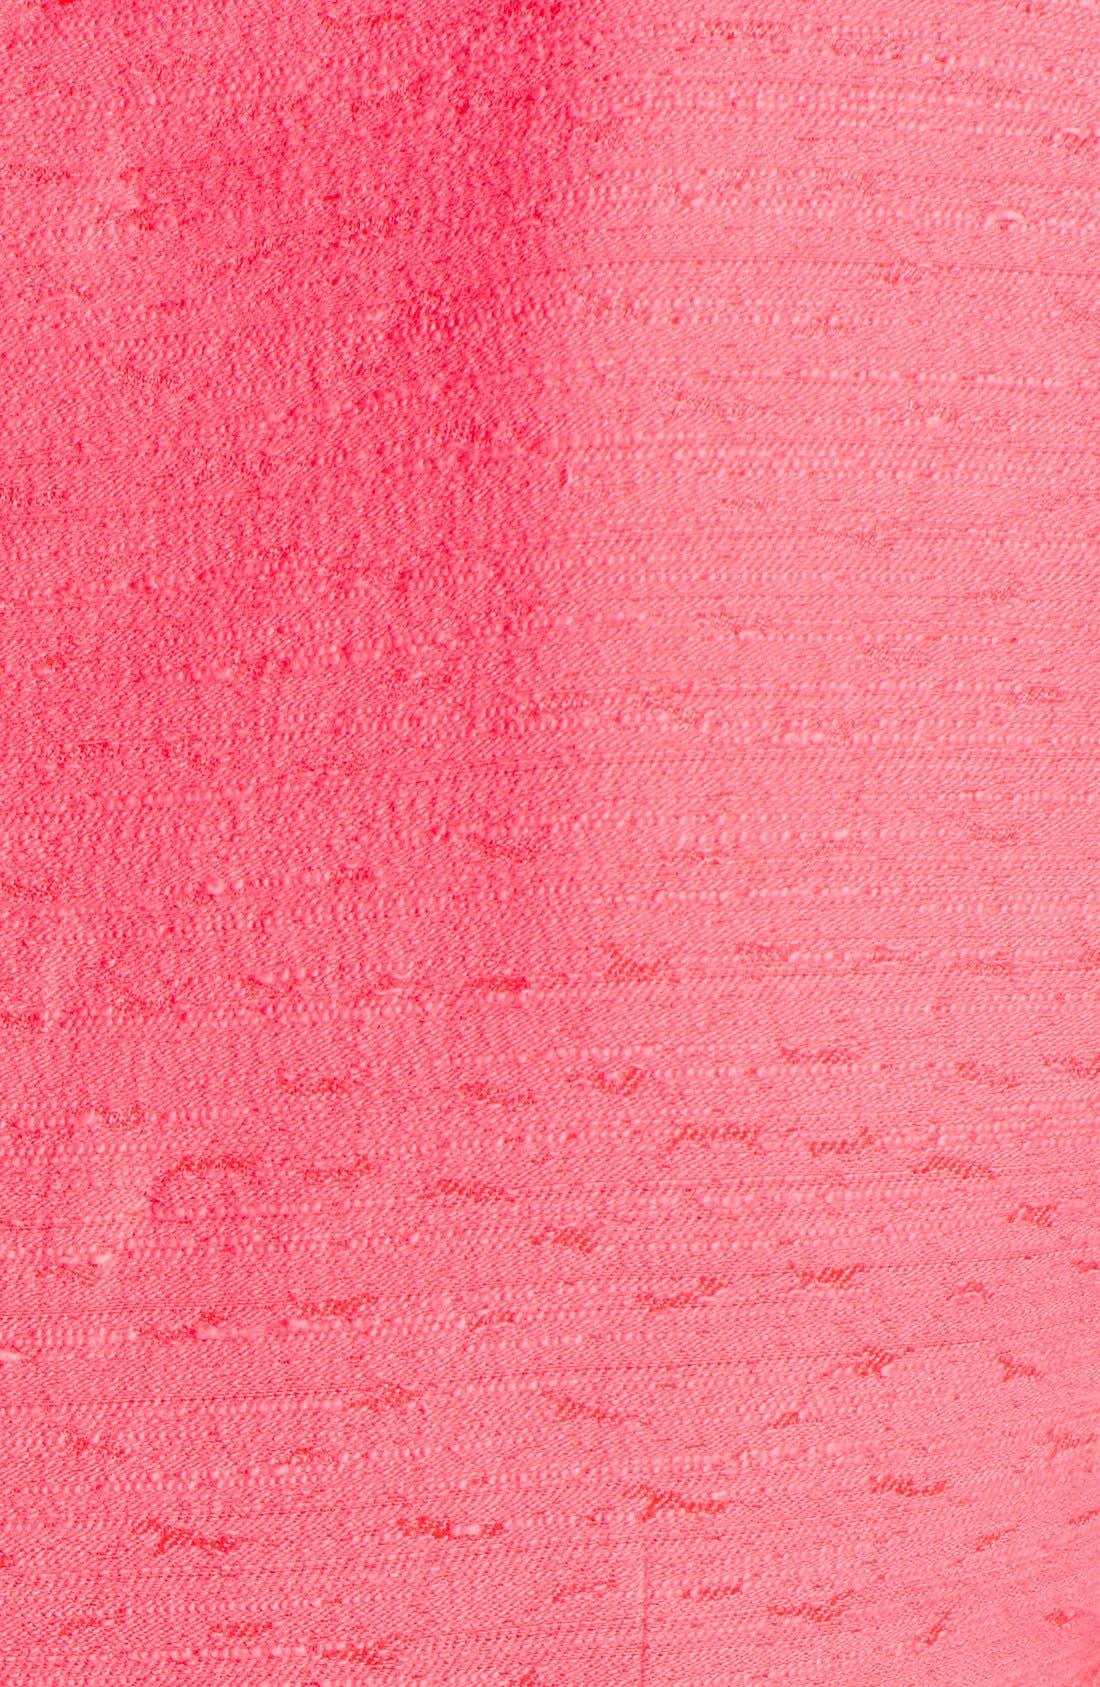 Alternate Image 3  - kate spade new york 'gwendolyn' woven sheath dress